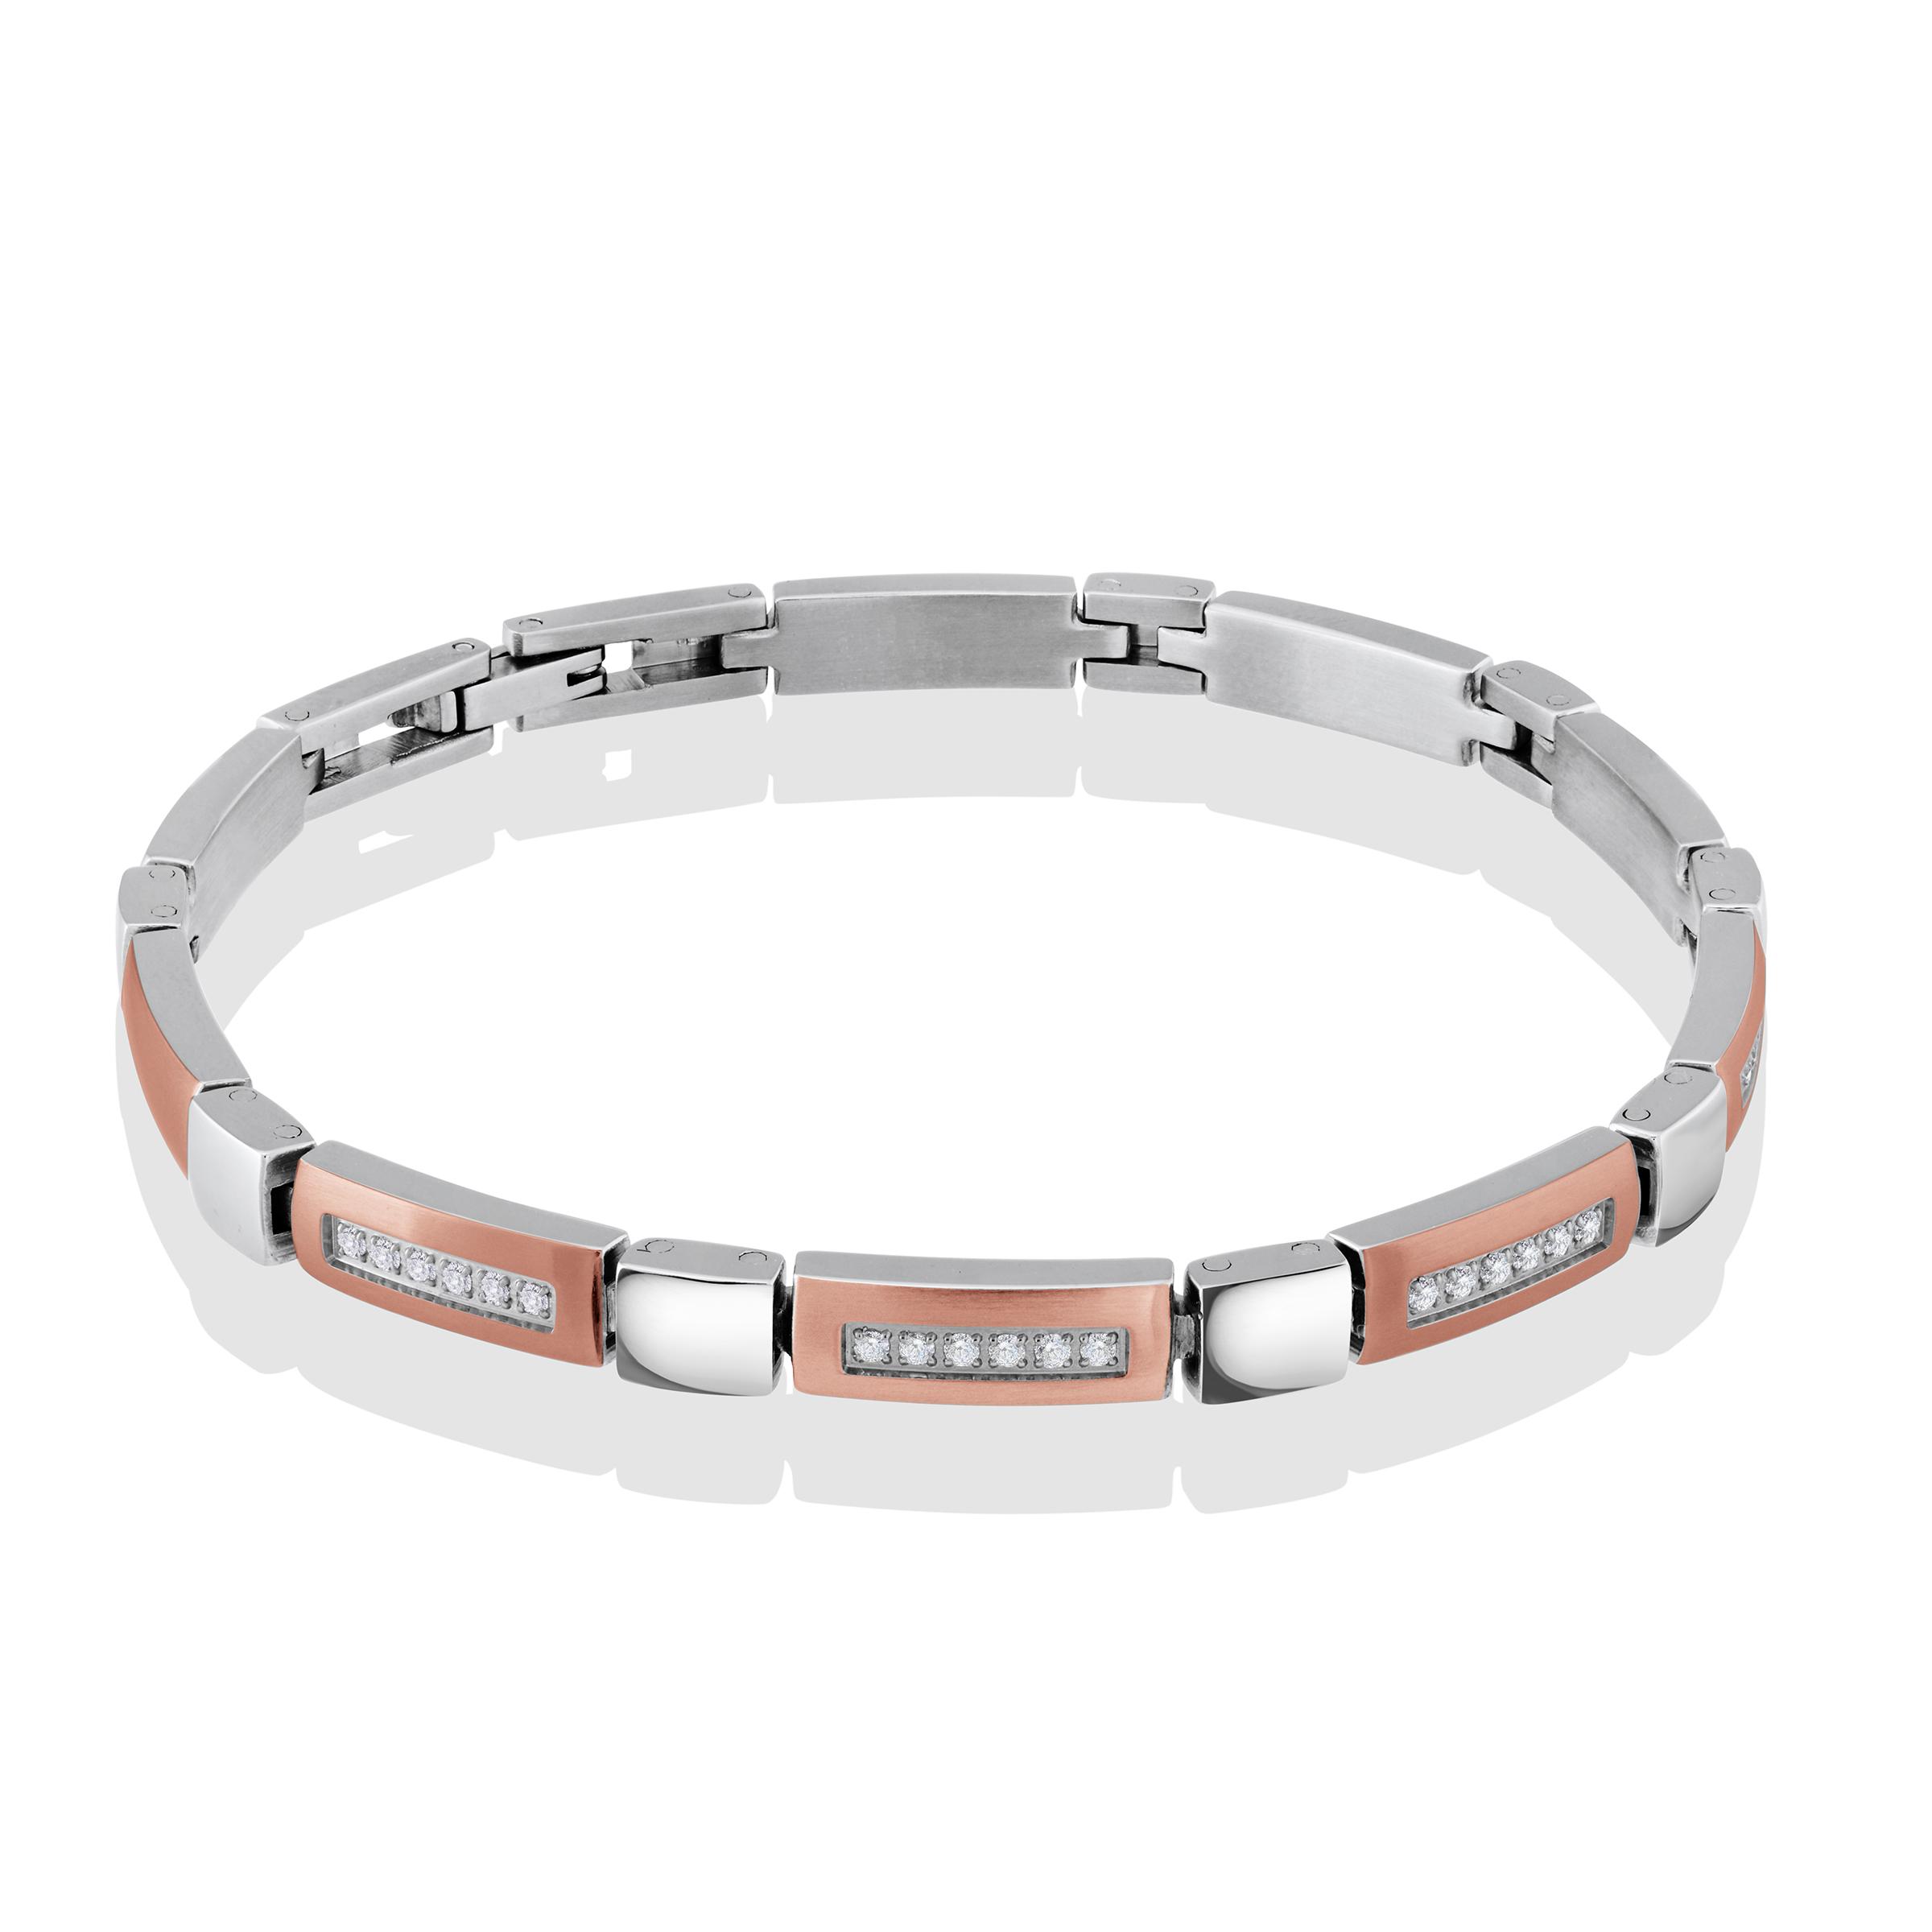 Women's bracelet - 2-tone stainless steel & cubic zirconia